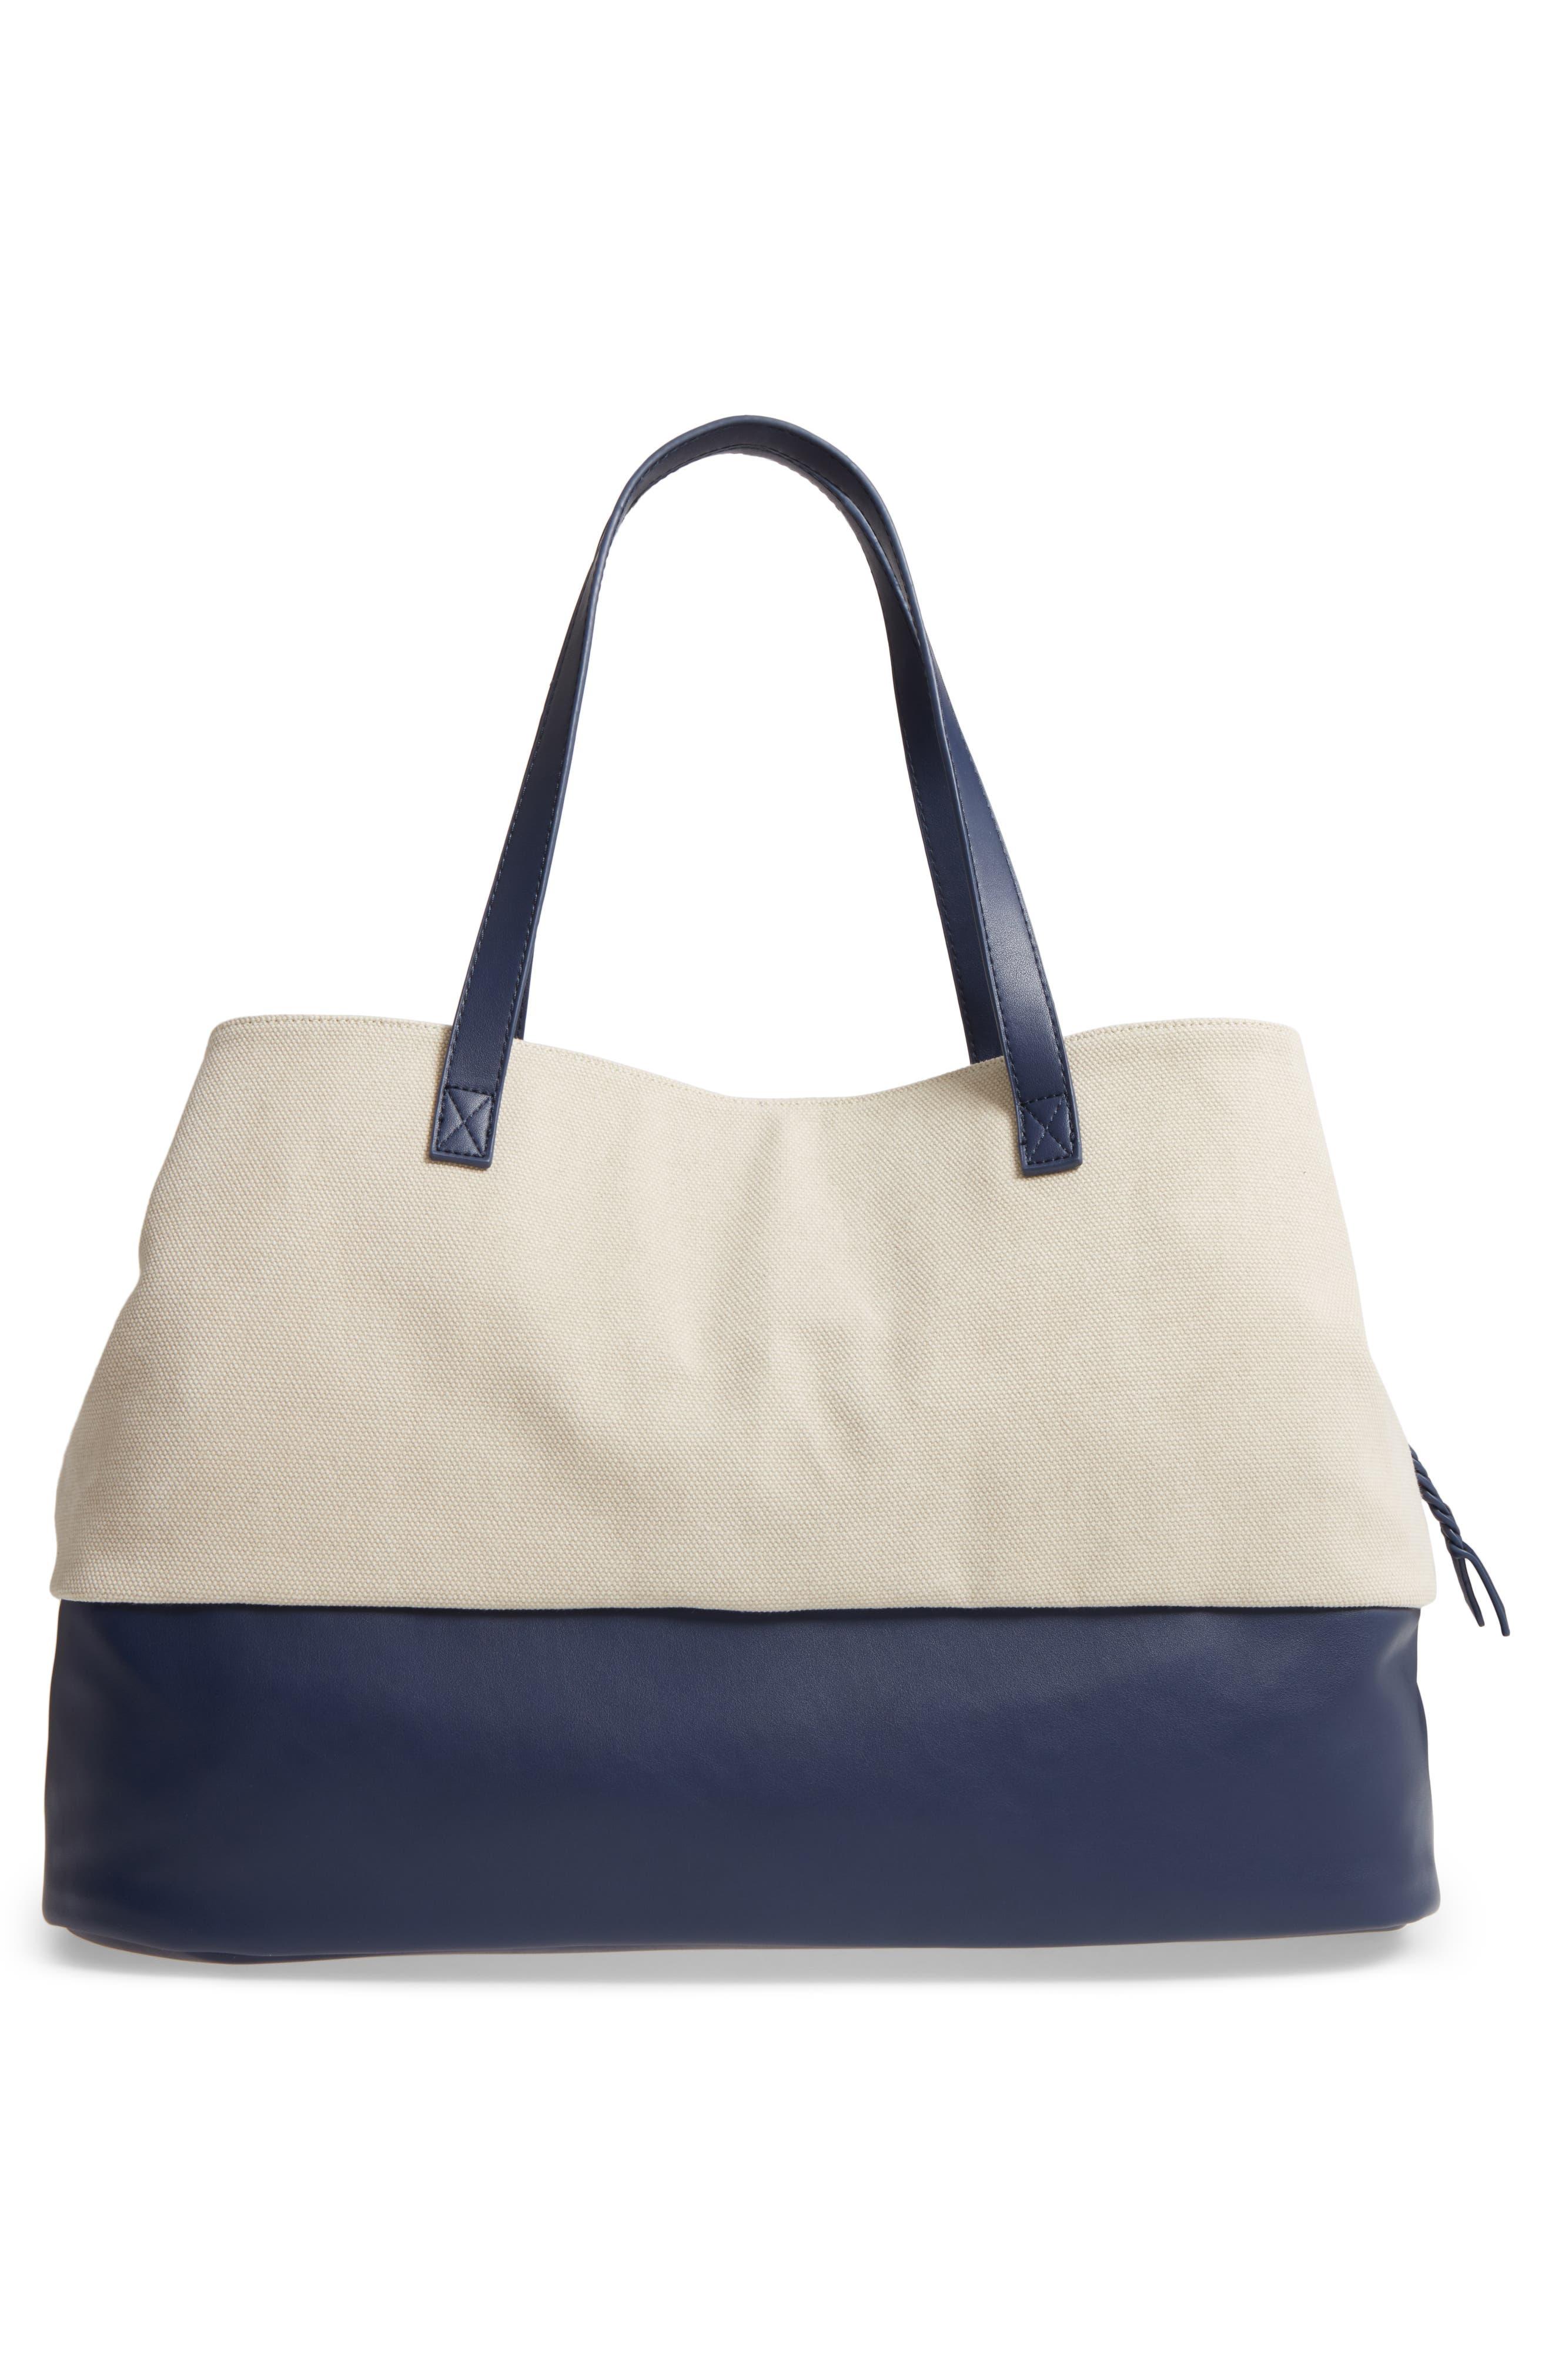 Two Toned Weekender Bag,                             Alternate thumbnail 3, color,                             Cream/ Navy